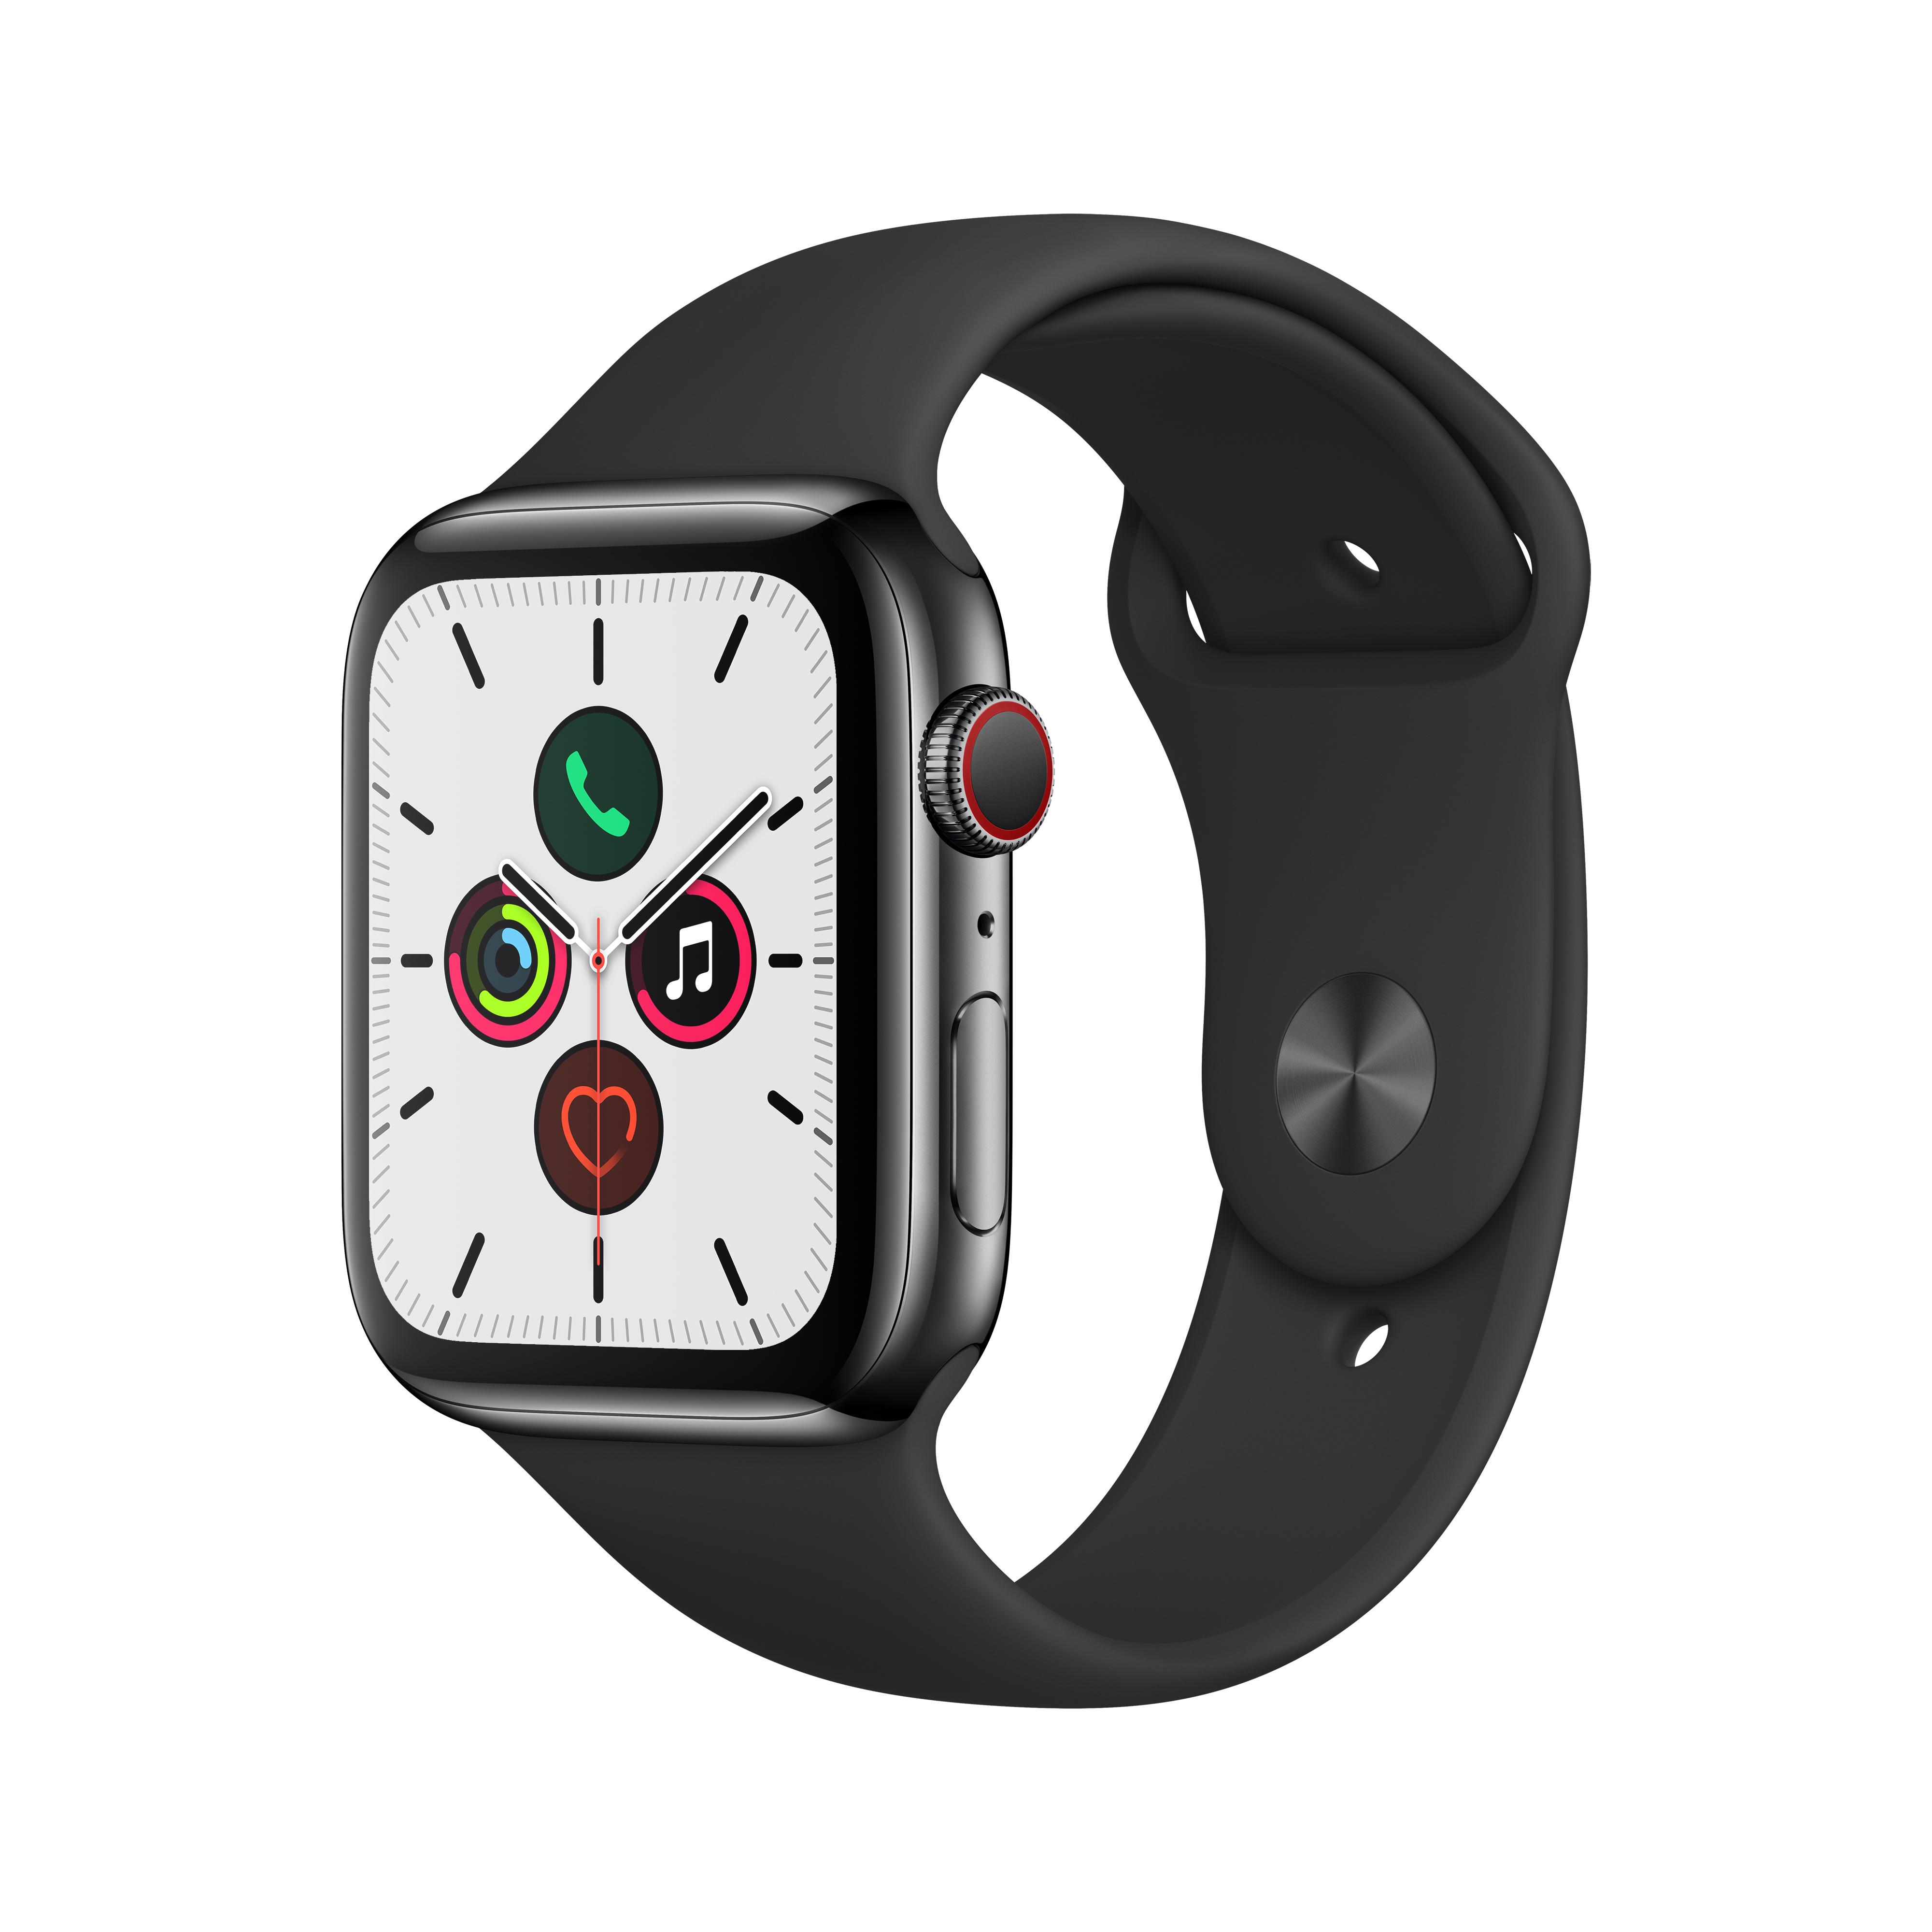 Apple 애플워치5 GPS + 셀룰러 44mm 스포츠밴드 + 스테인리스스틸 케이스, 스페이스 블랙(MWWK2KH/A), 블랙(밴드)